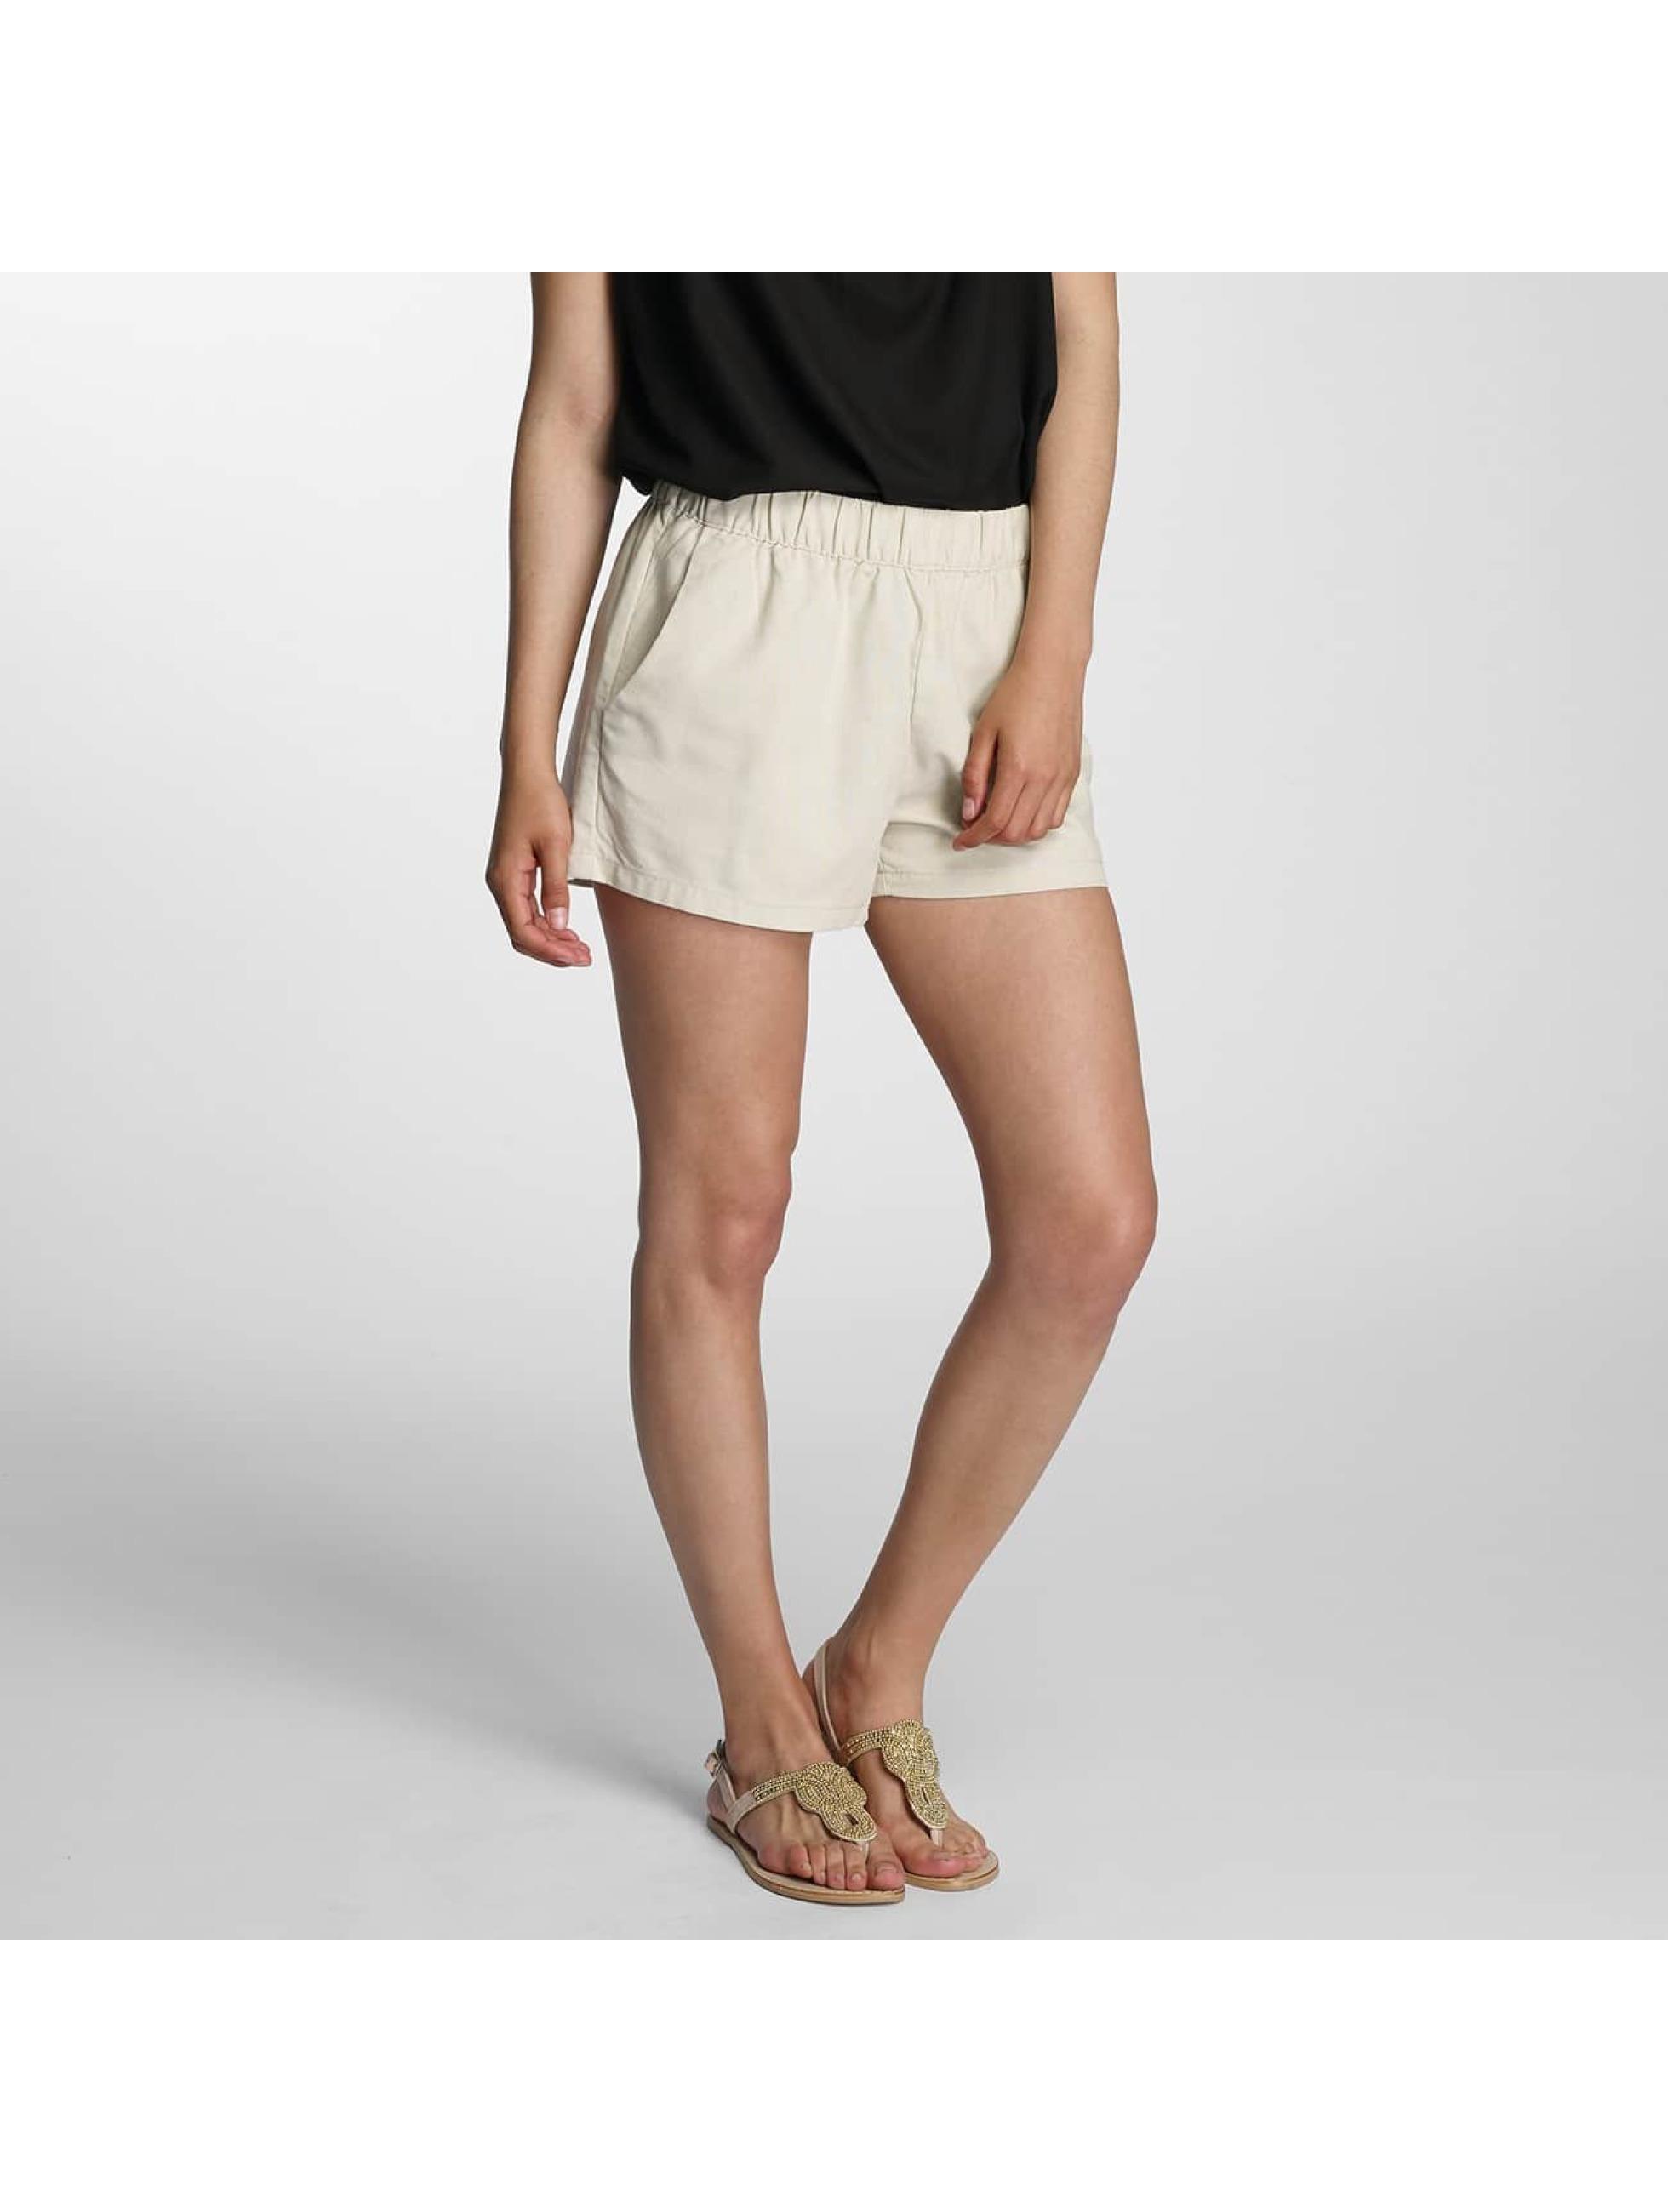 Vero Moda Frauen Shorts VMMilo in beige